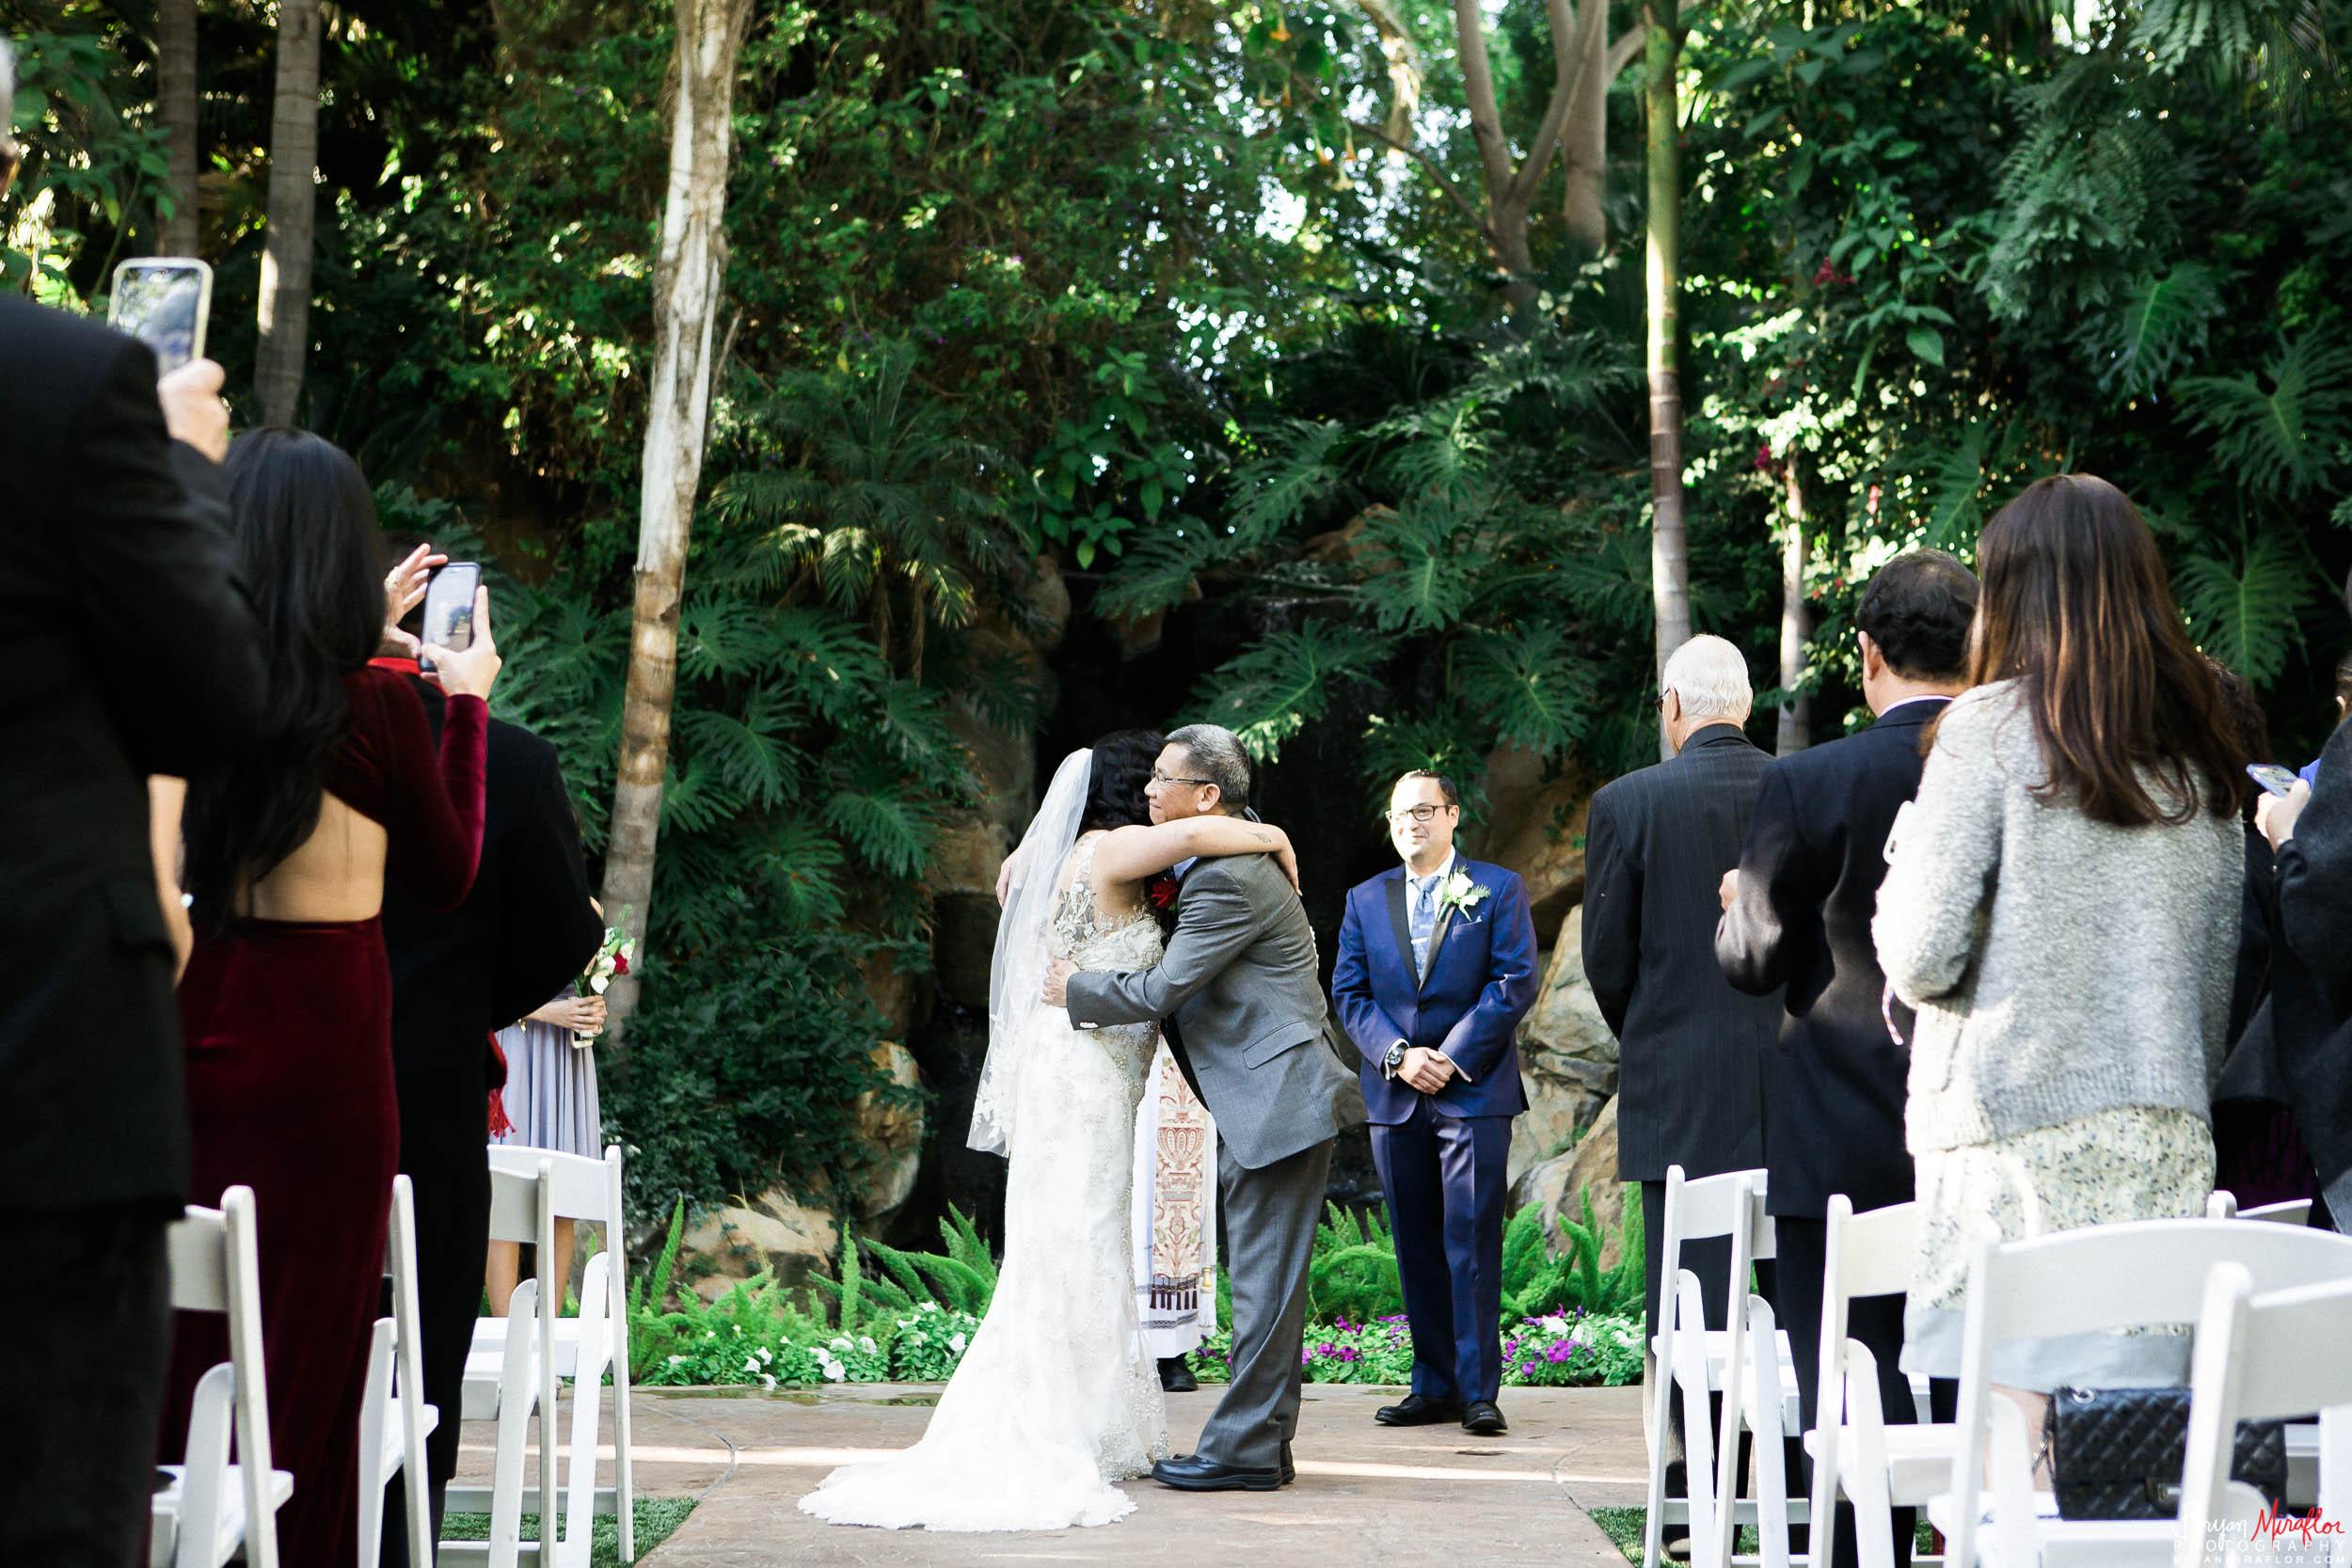 Bryan-Miraflor-Photography-Hannah-Jonathan-Married-Grand-Traditions-Estate-Gardens-Fallbrook-20171222-094.jpg